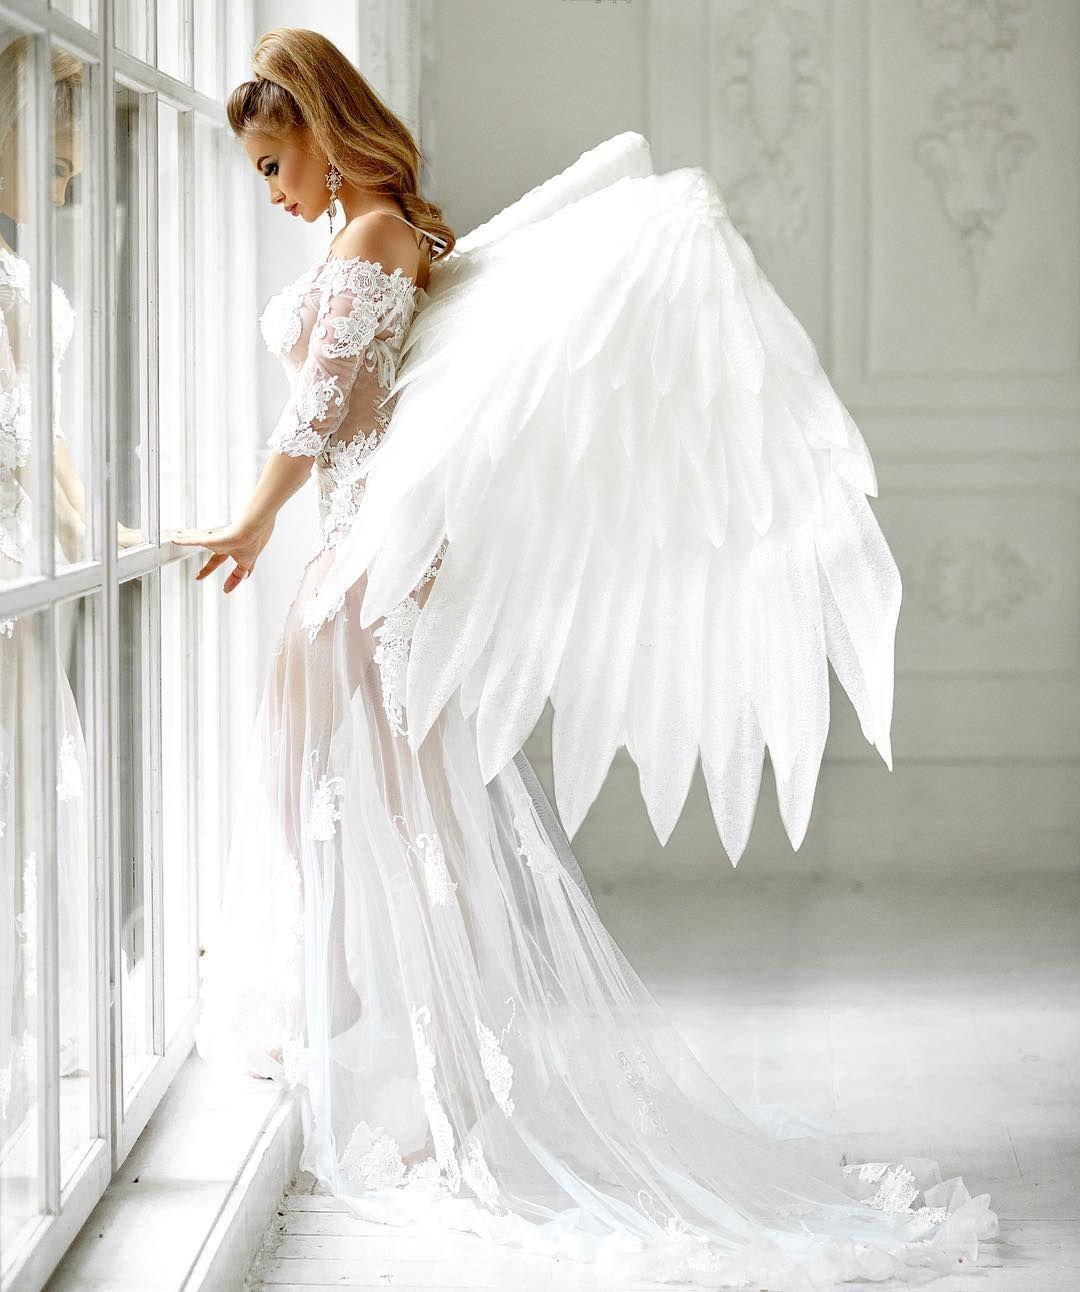 ангел крылья фото сказки легенды